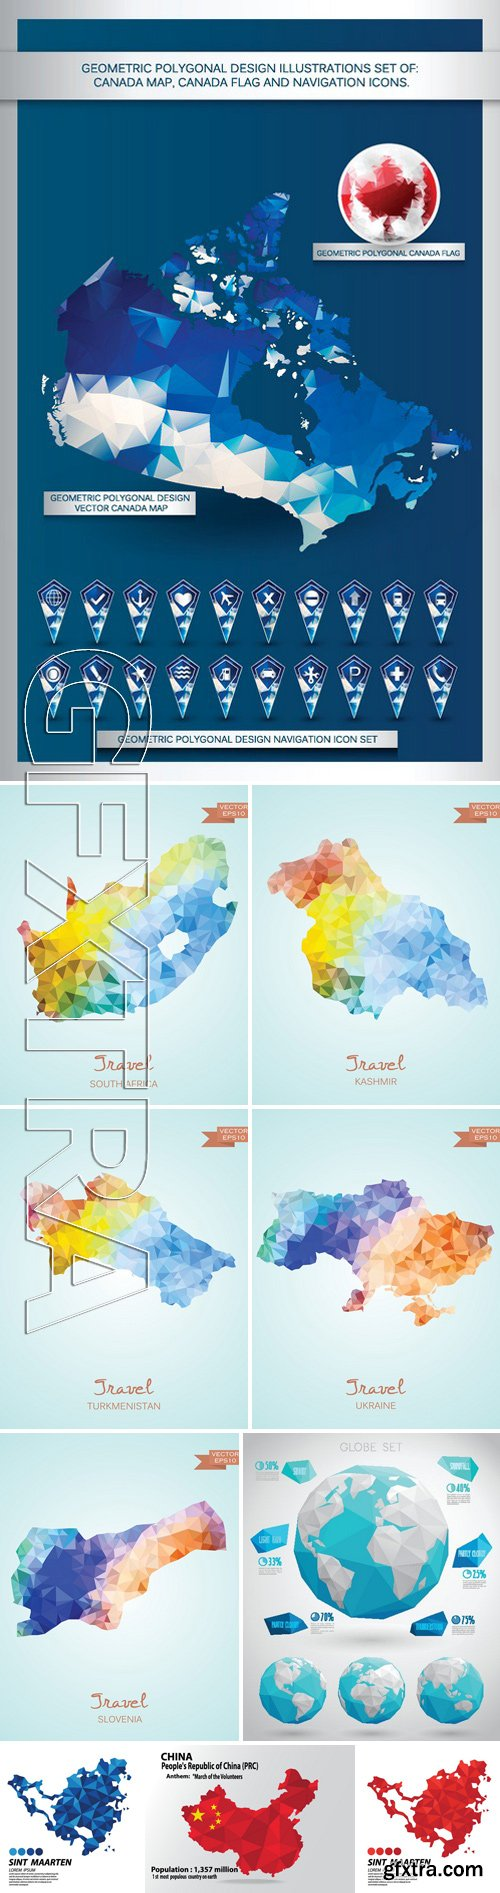 Stock Vectors - Geometric Polygonal Design Illustrations Set Of Map